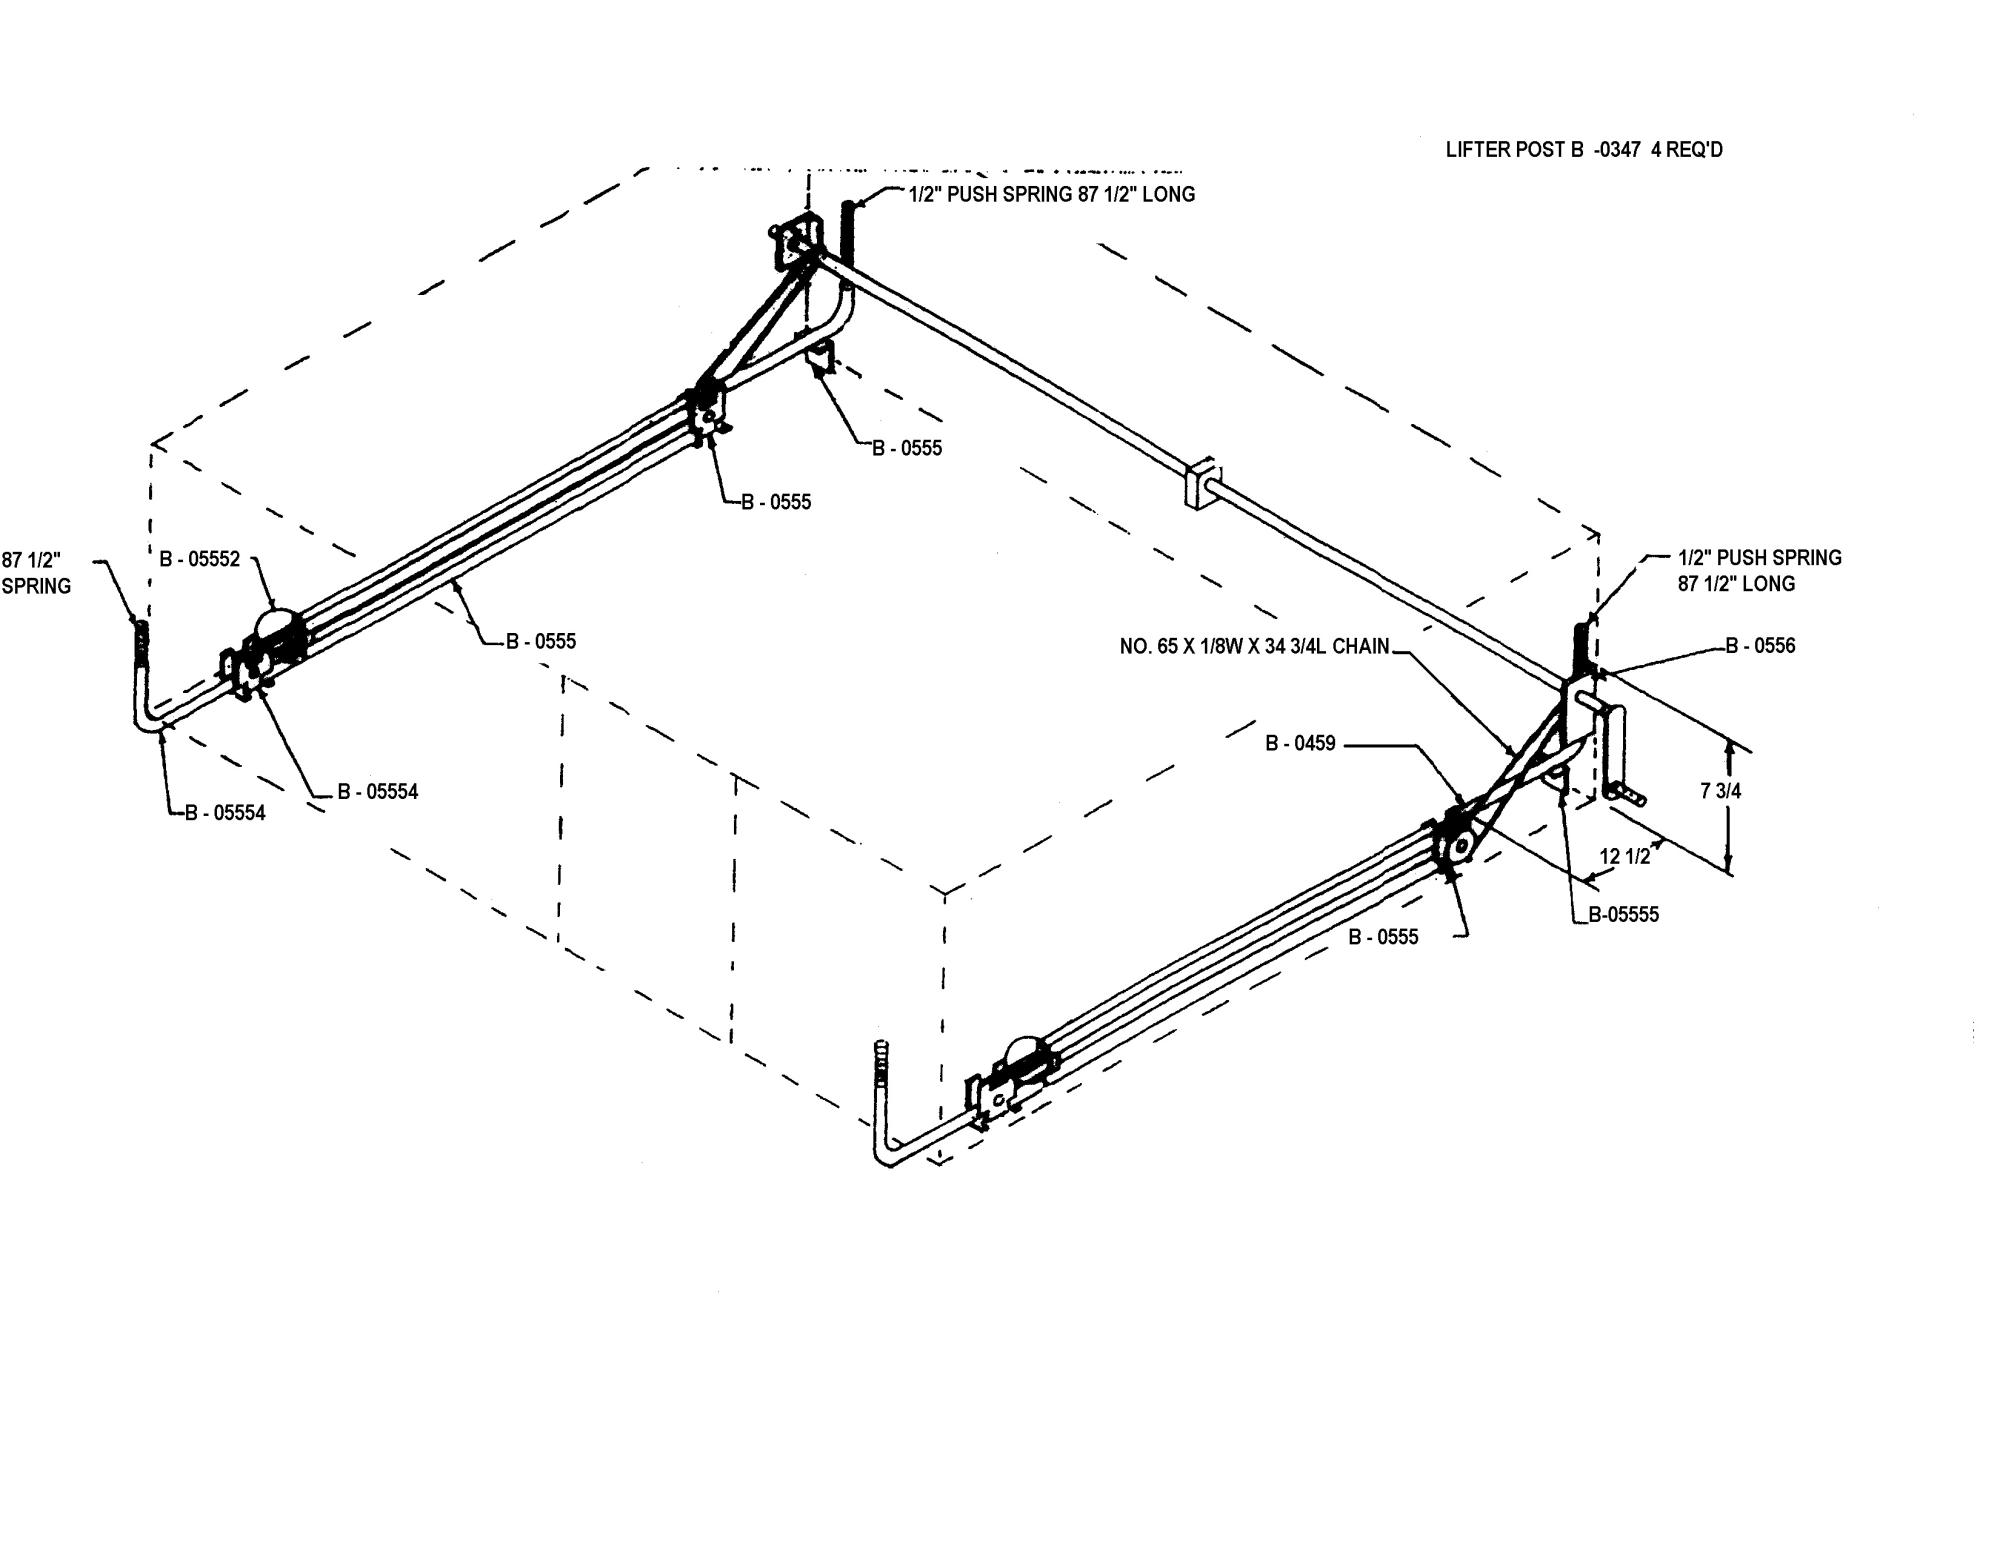 YF_4084] Gs Moon Mini Bike Wiring Diagram Free Diagram   Gs Moon Wiring Diagrams      Jidig Barba Benkeme Mohammedshrine Librar Wiring 101